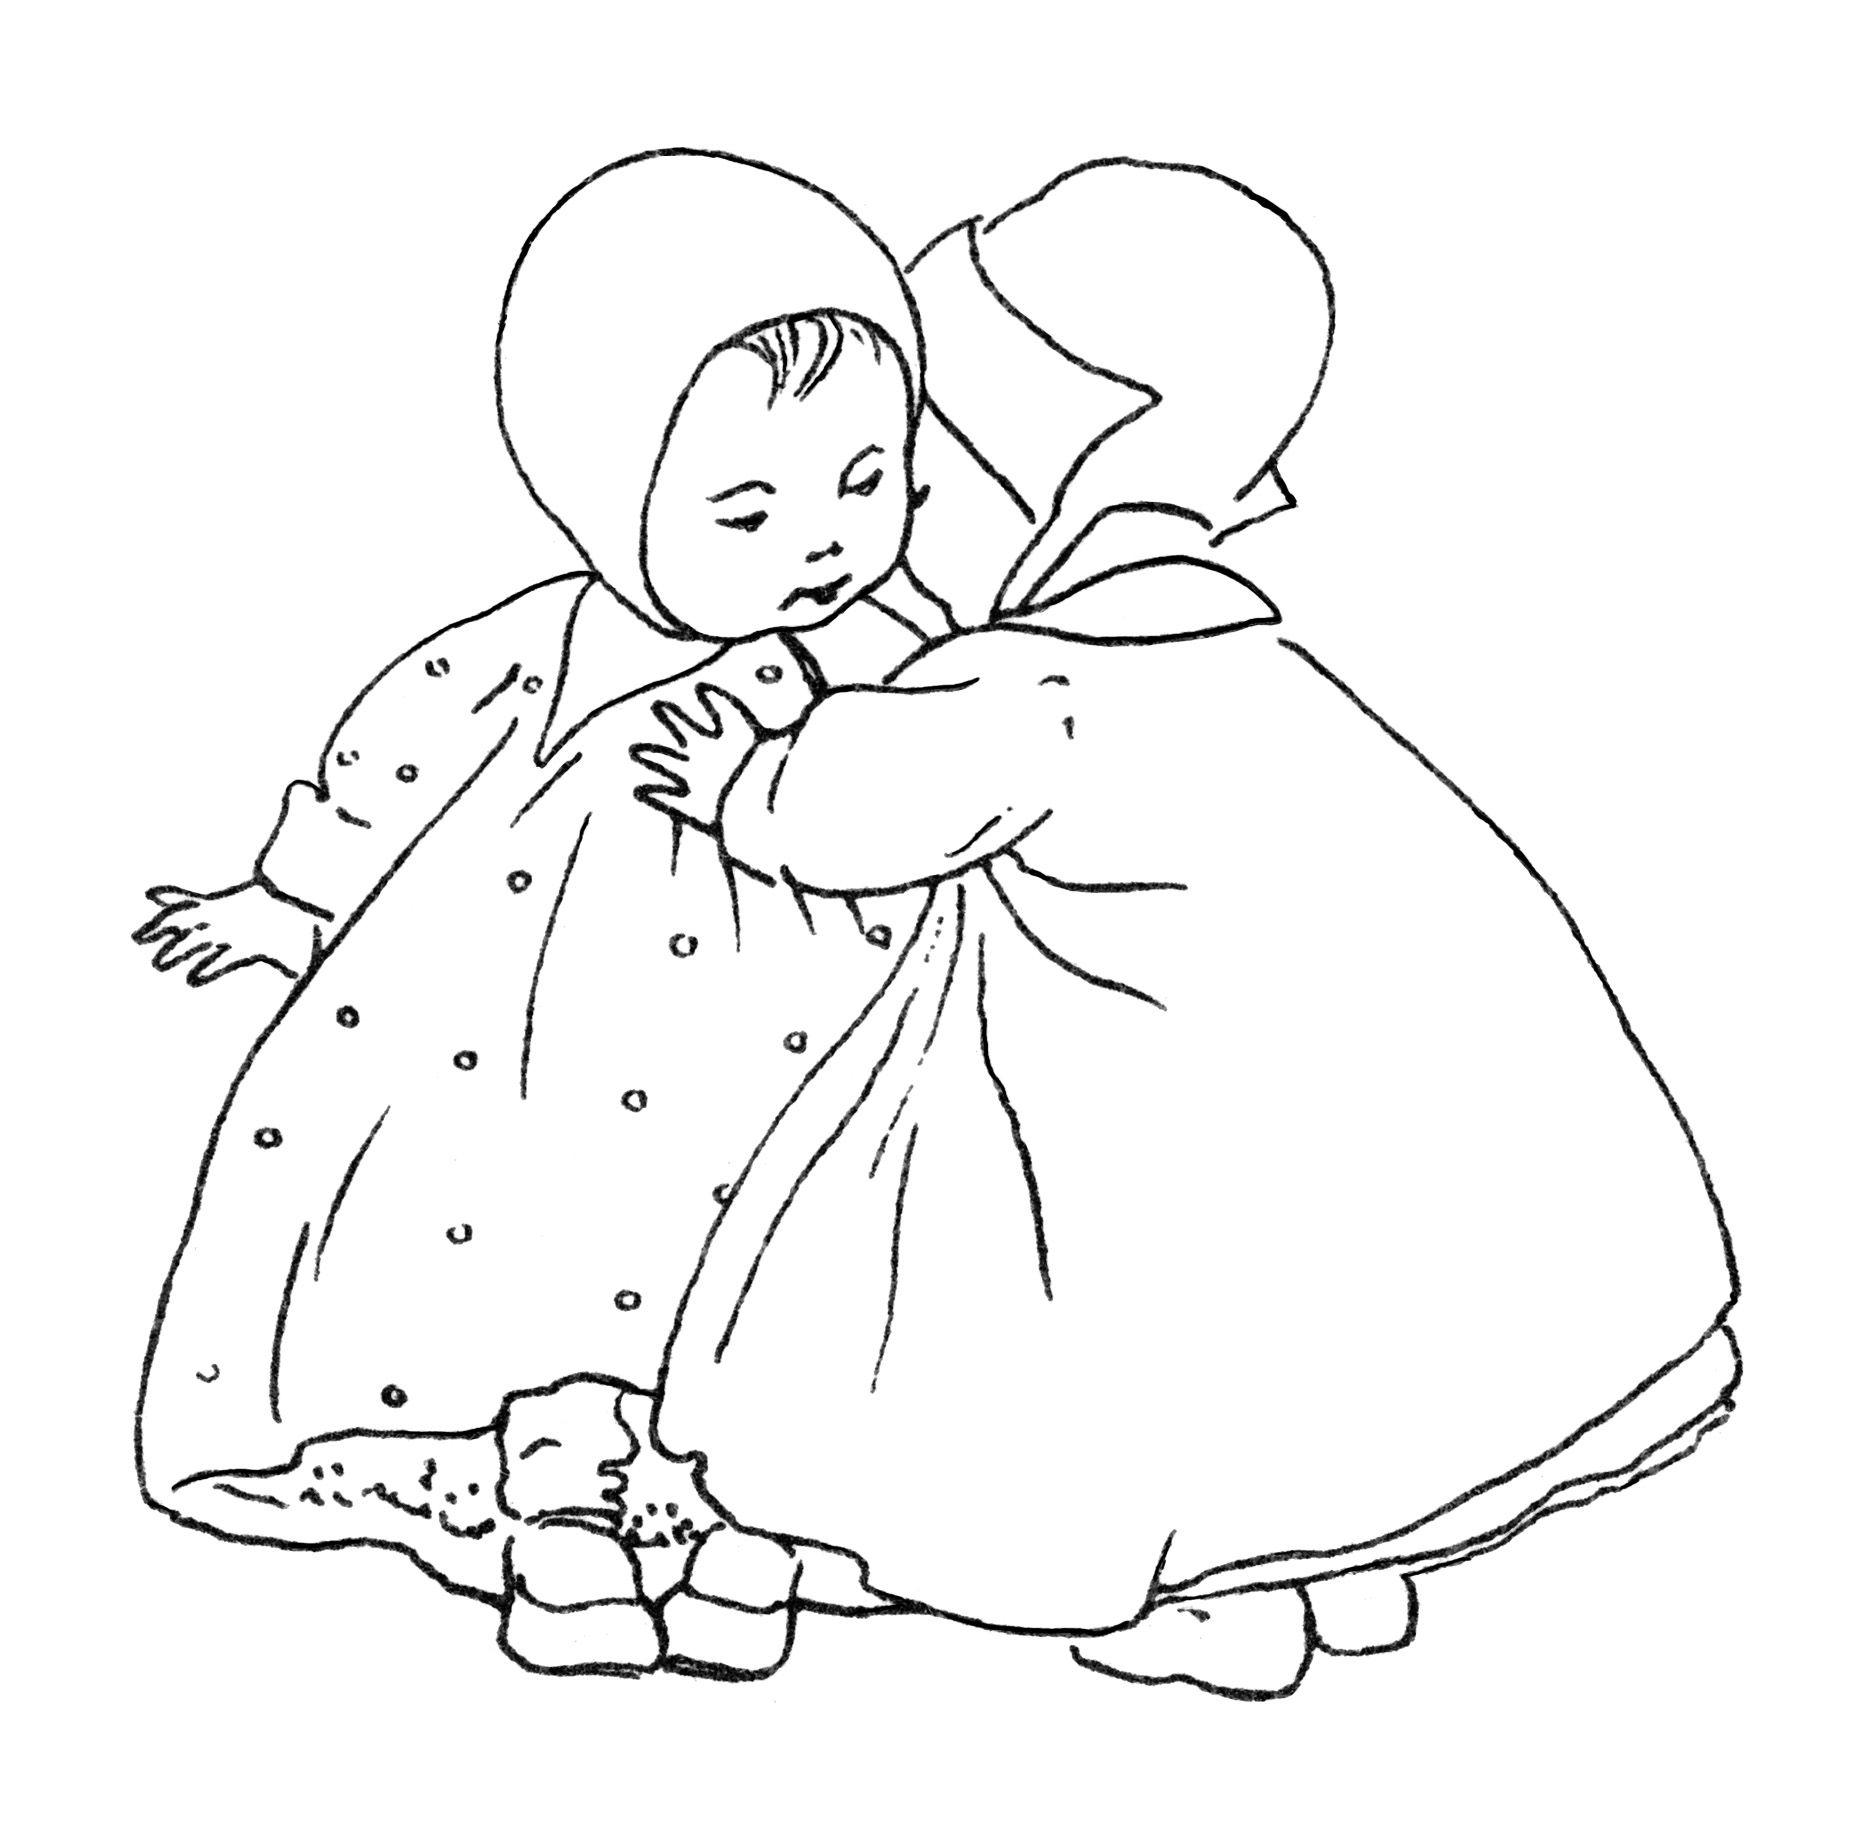 Baby Clip Art Black And White Clipart Vintage Children